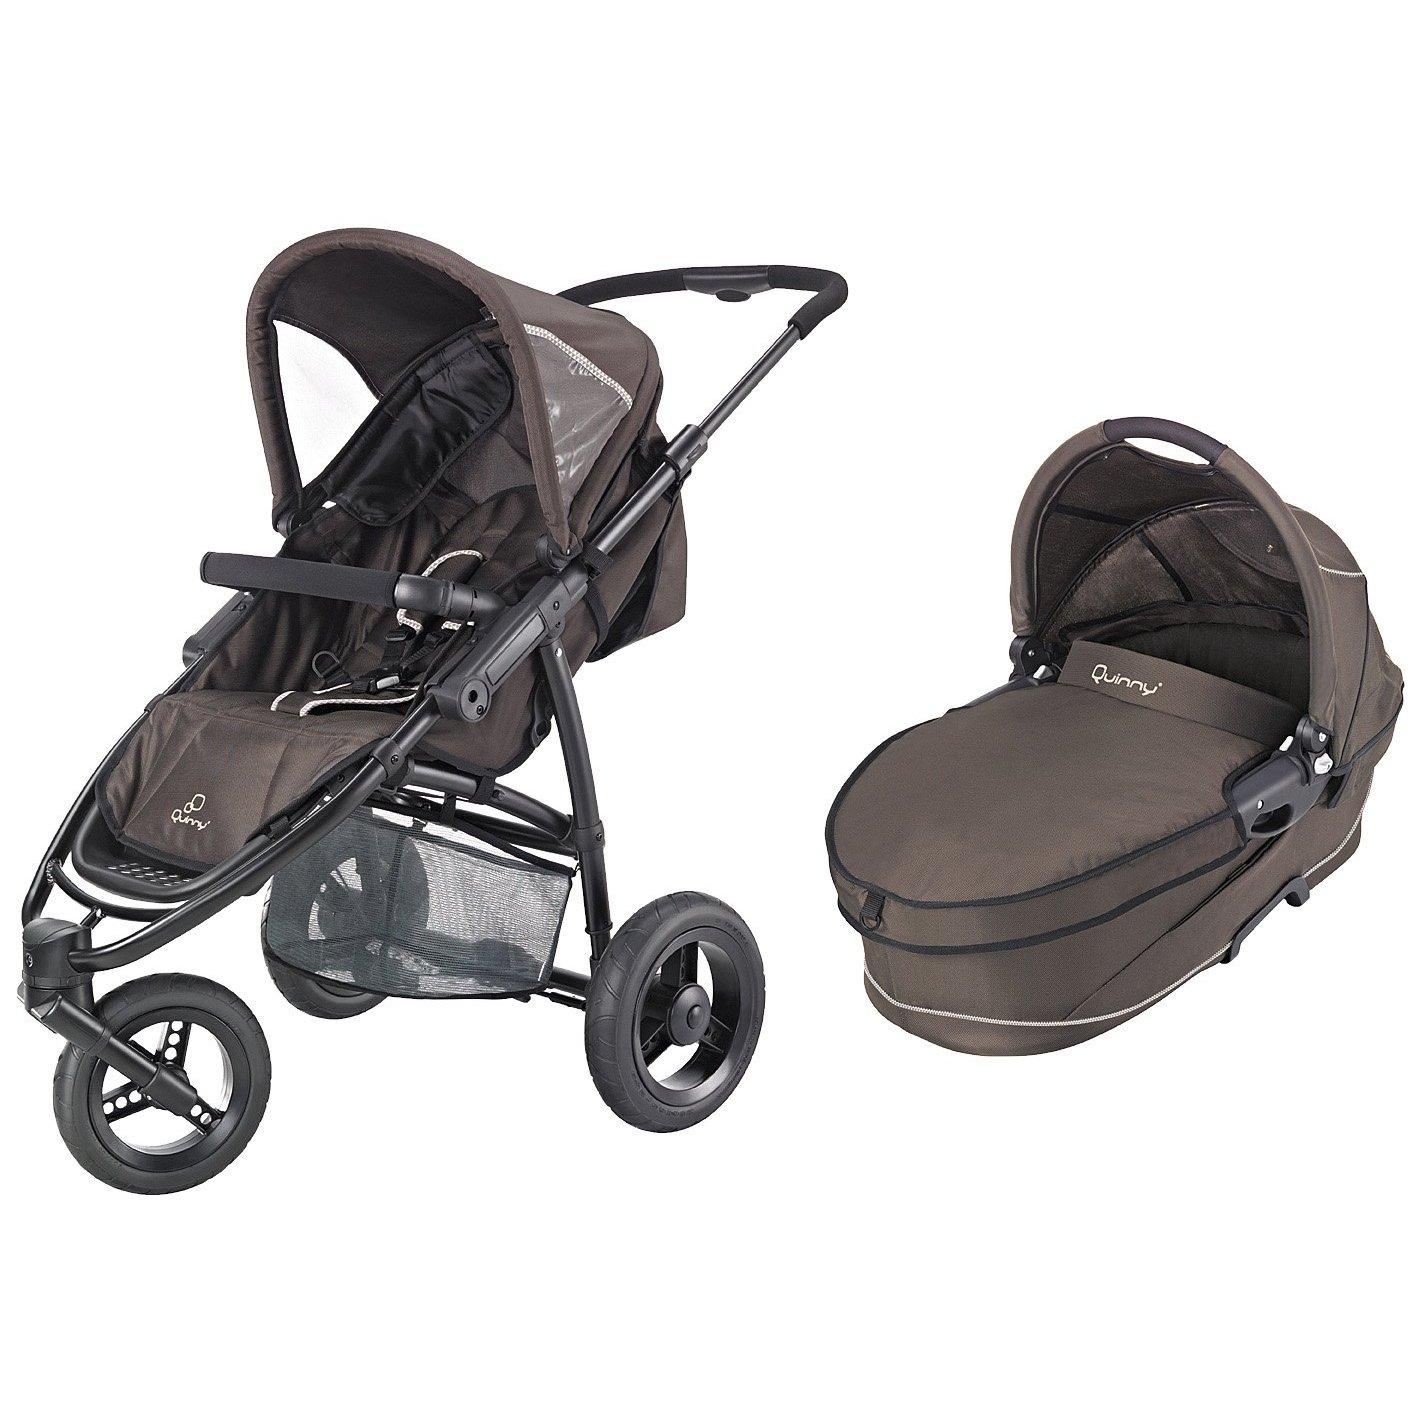 Nieuw Quinny Speedi Set Travelsystem inklusive Kinderwagenaufsatz WC-63